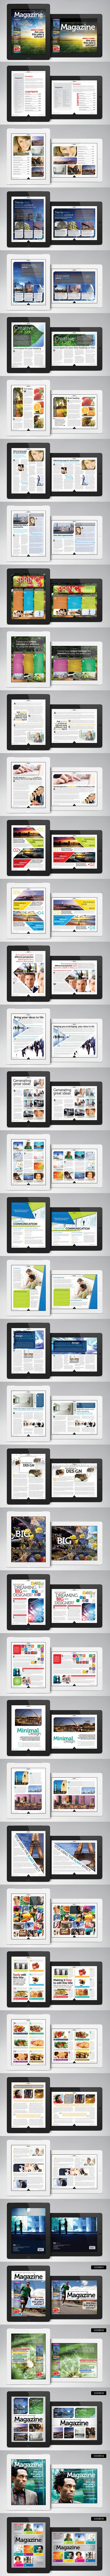 iPad/Tablet Magazine InDesign Layout 01 by BoxedCreative , via Behance